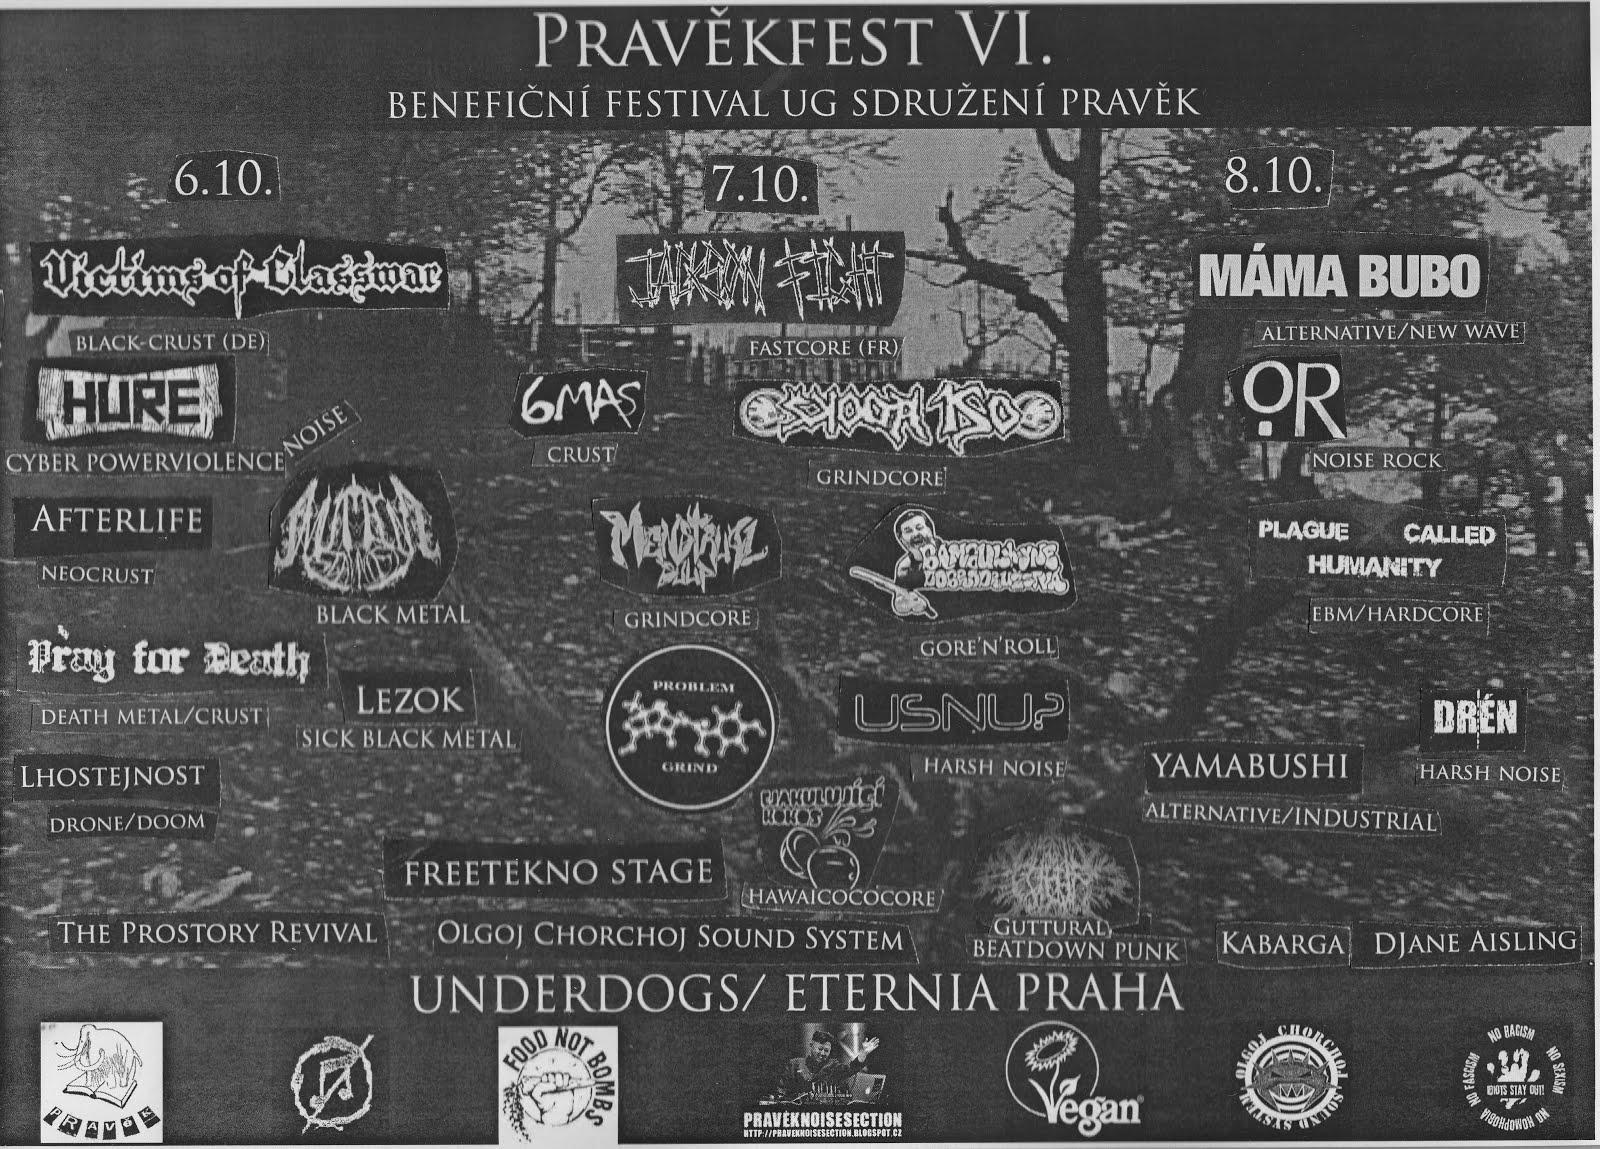 Pravěkfest VI